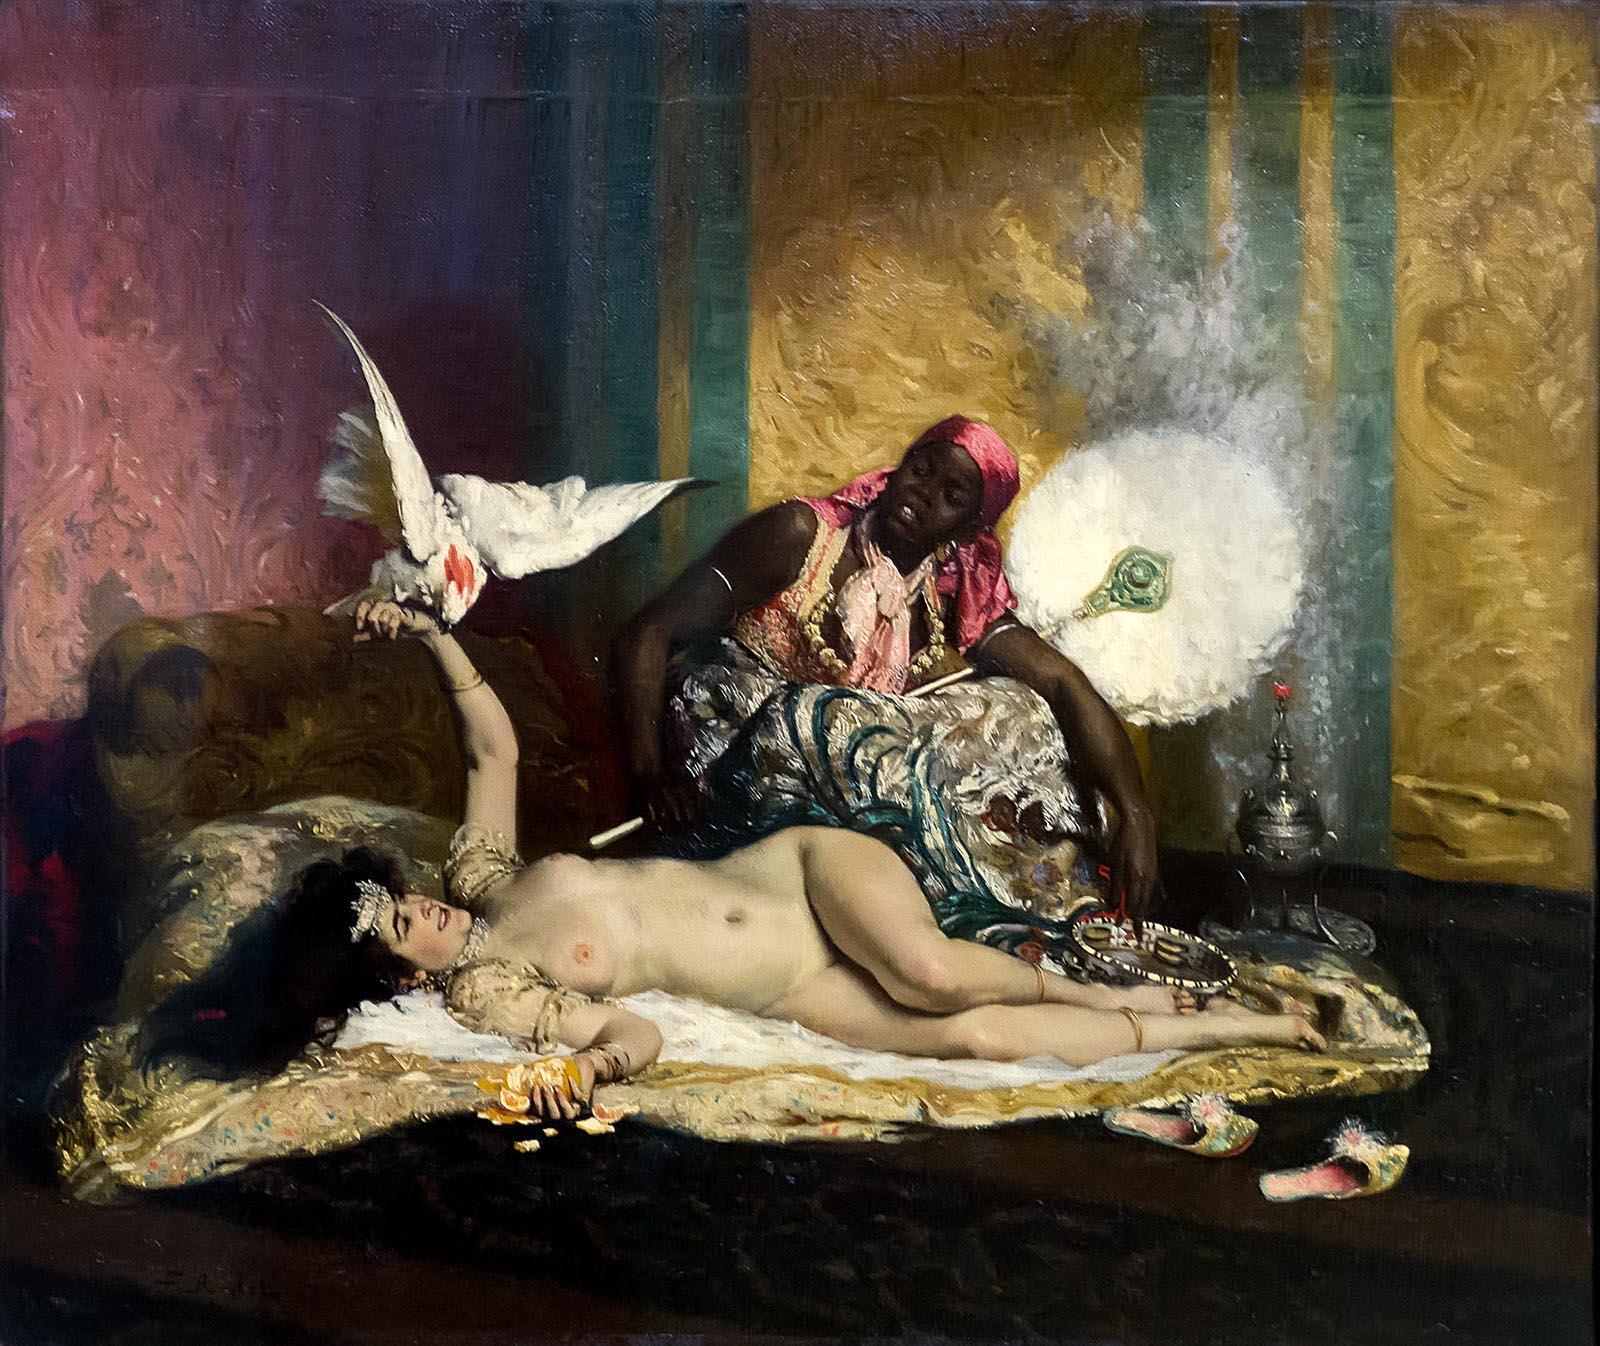 Фото №187846. ФЕРДИНАН РУАБЕ 1840-1920 Одалиска. Около 1870 Холст, масло